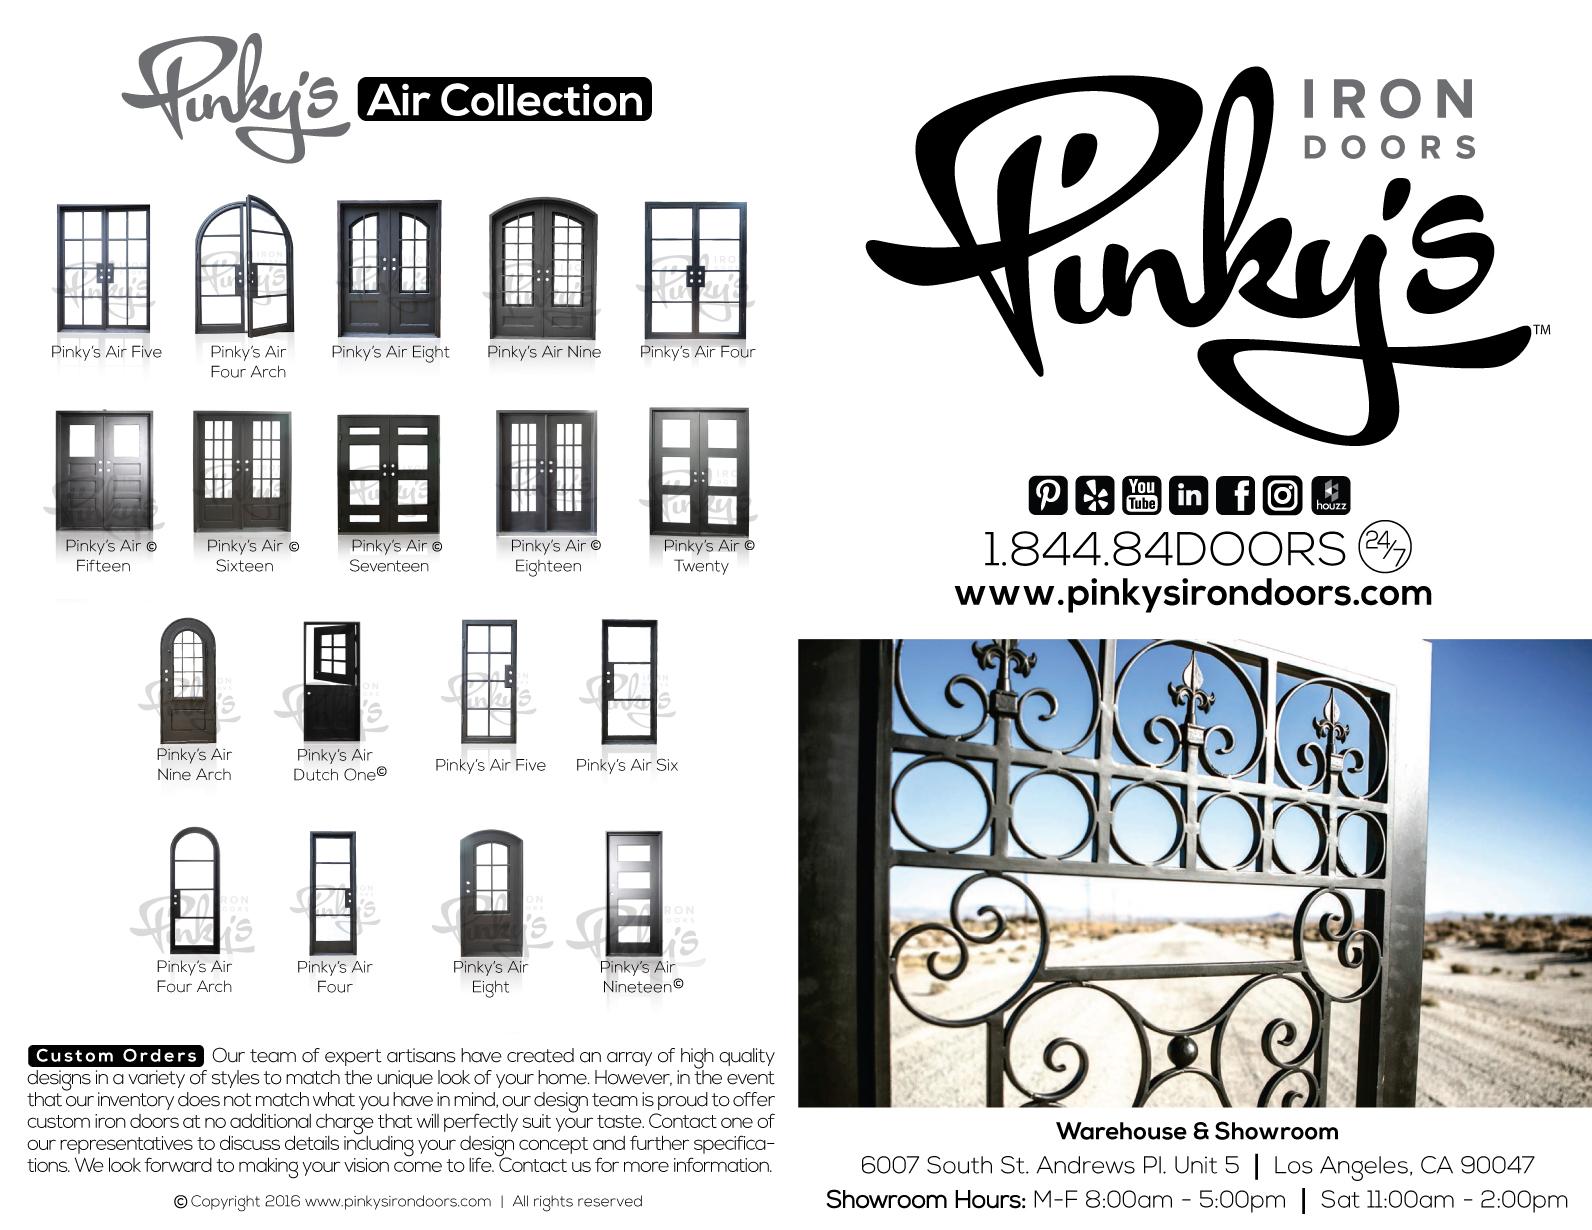 Pinky's Iron Doors image 22